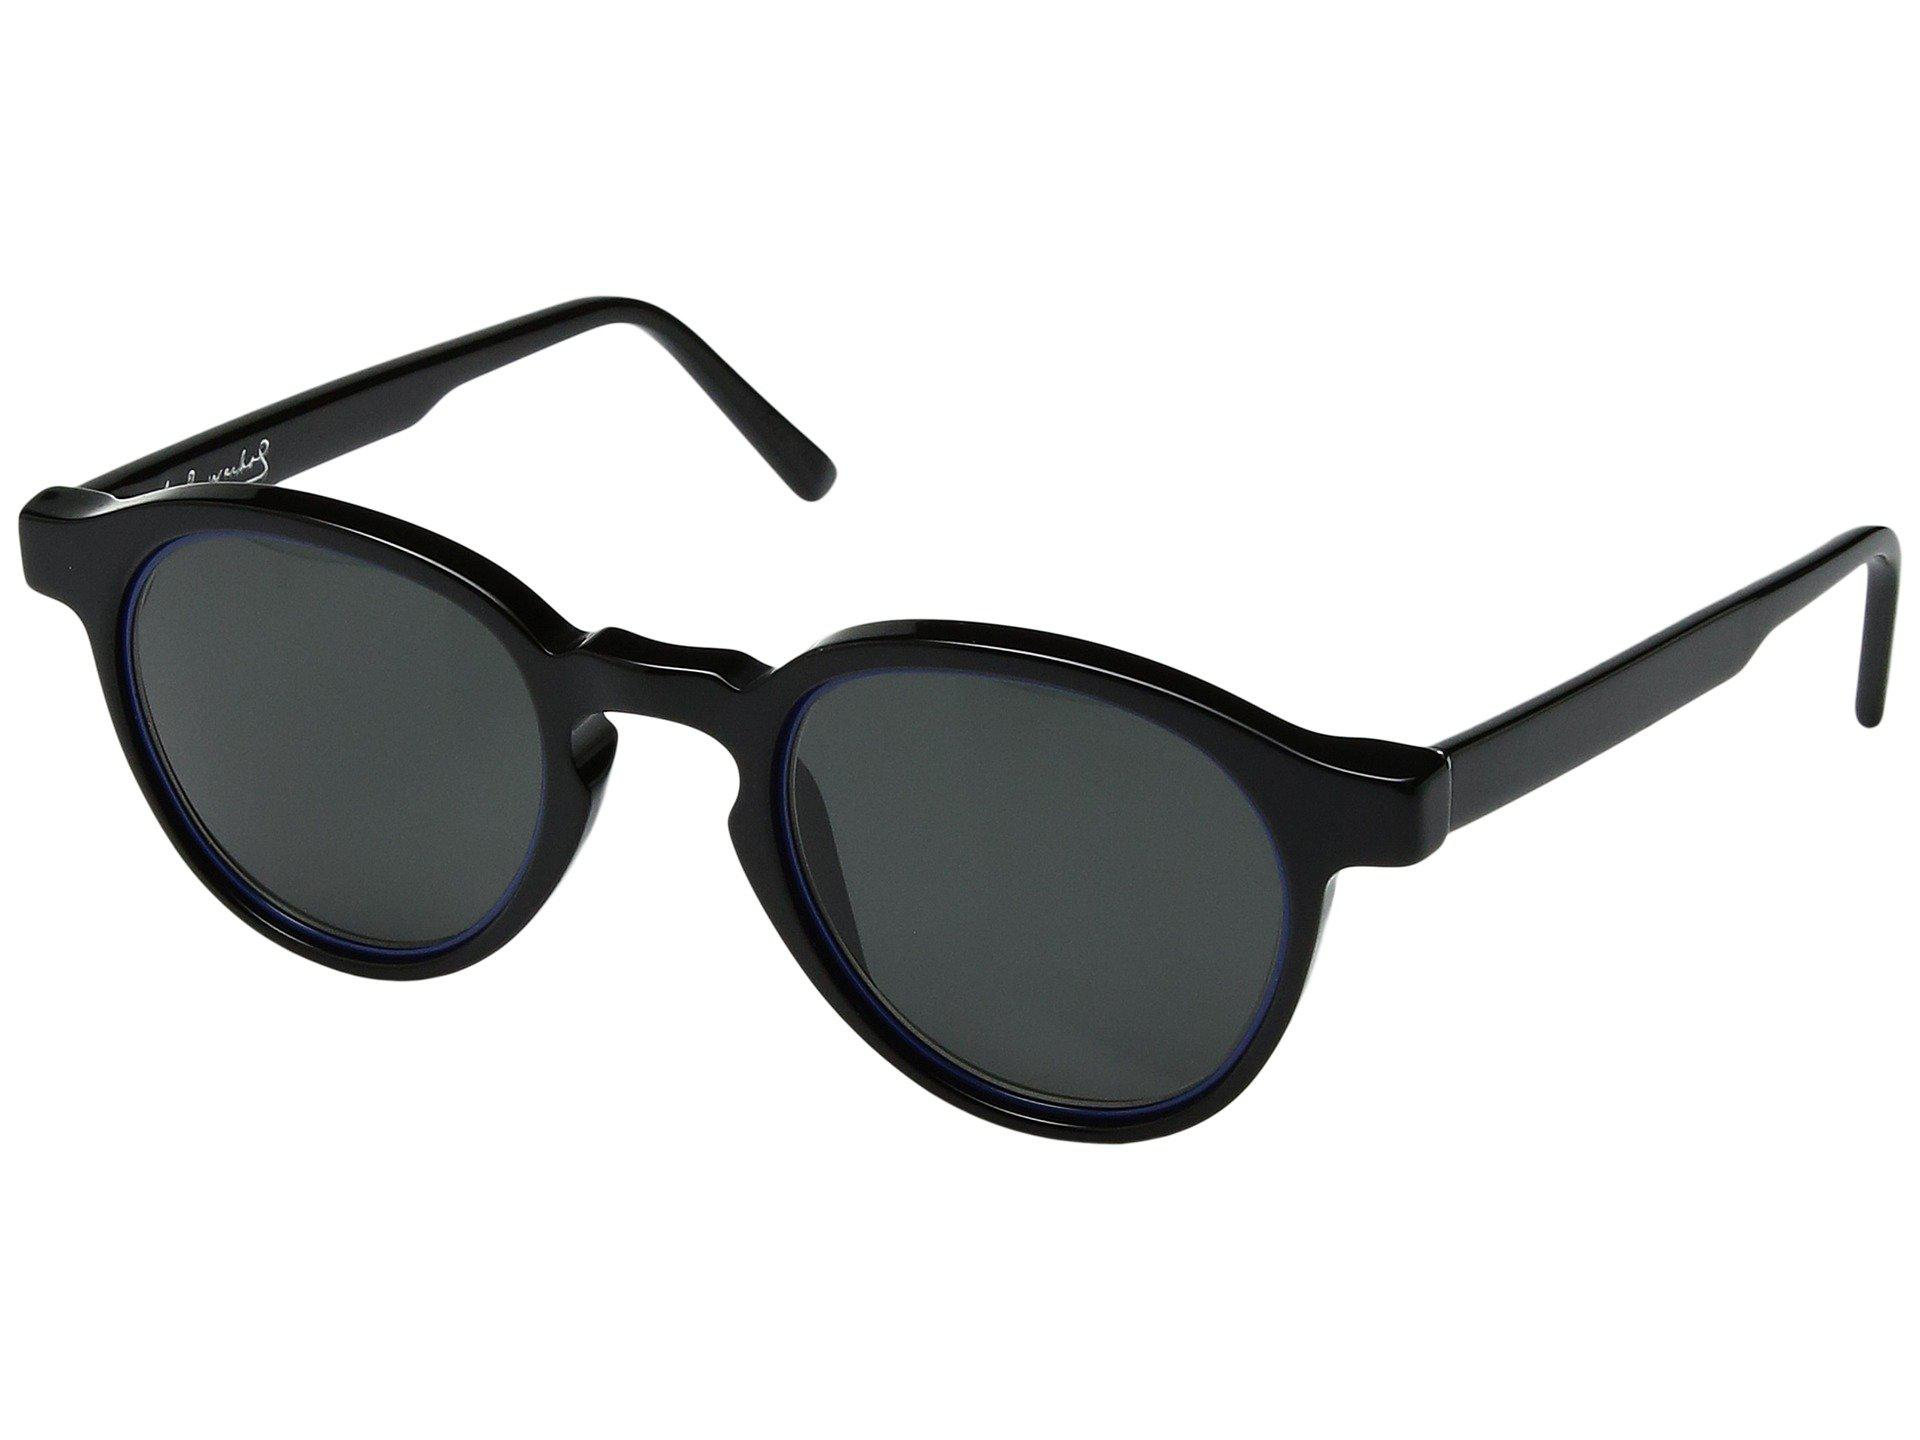 The Iconic sunglasses - Blue Retro Superfuture KYWsaER